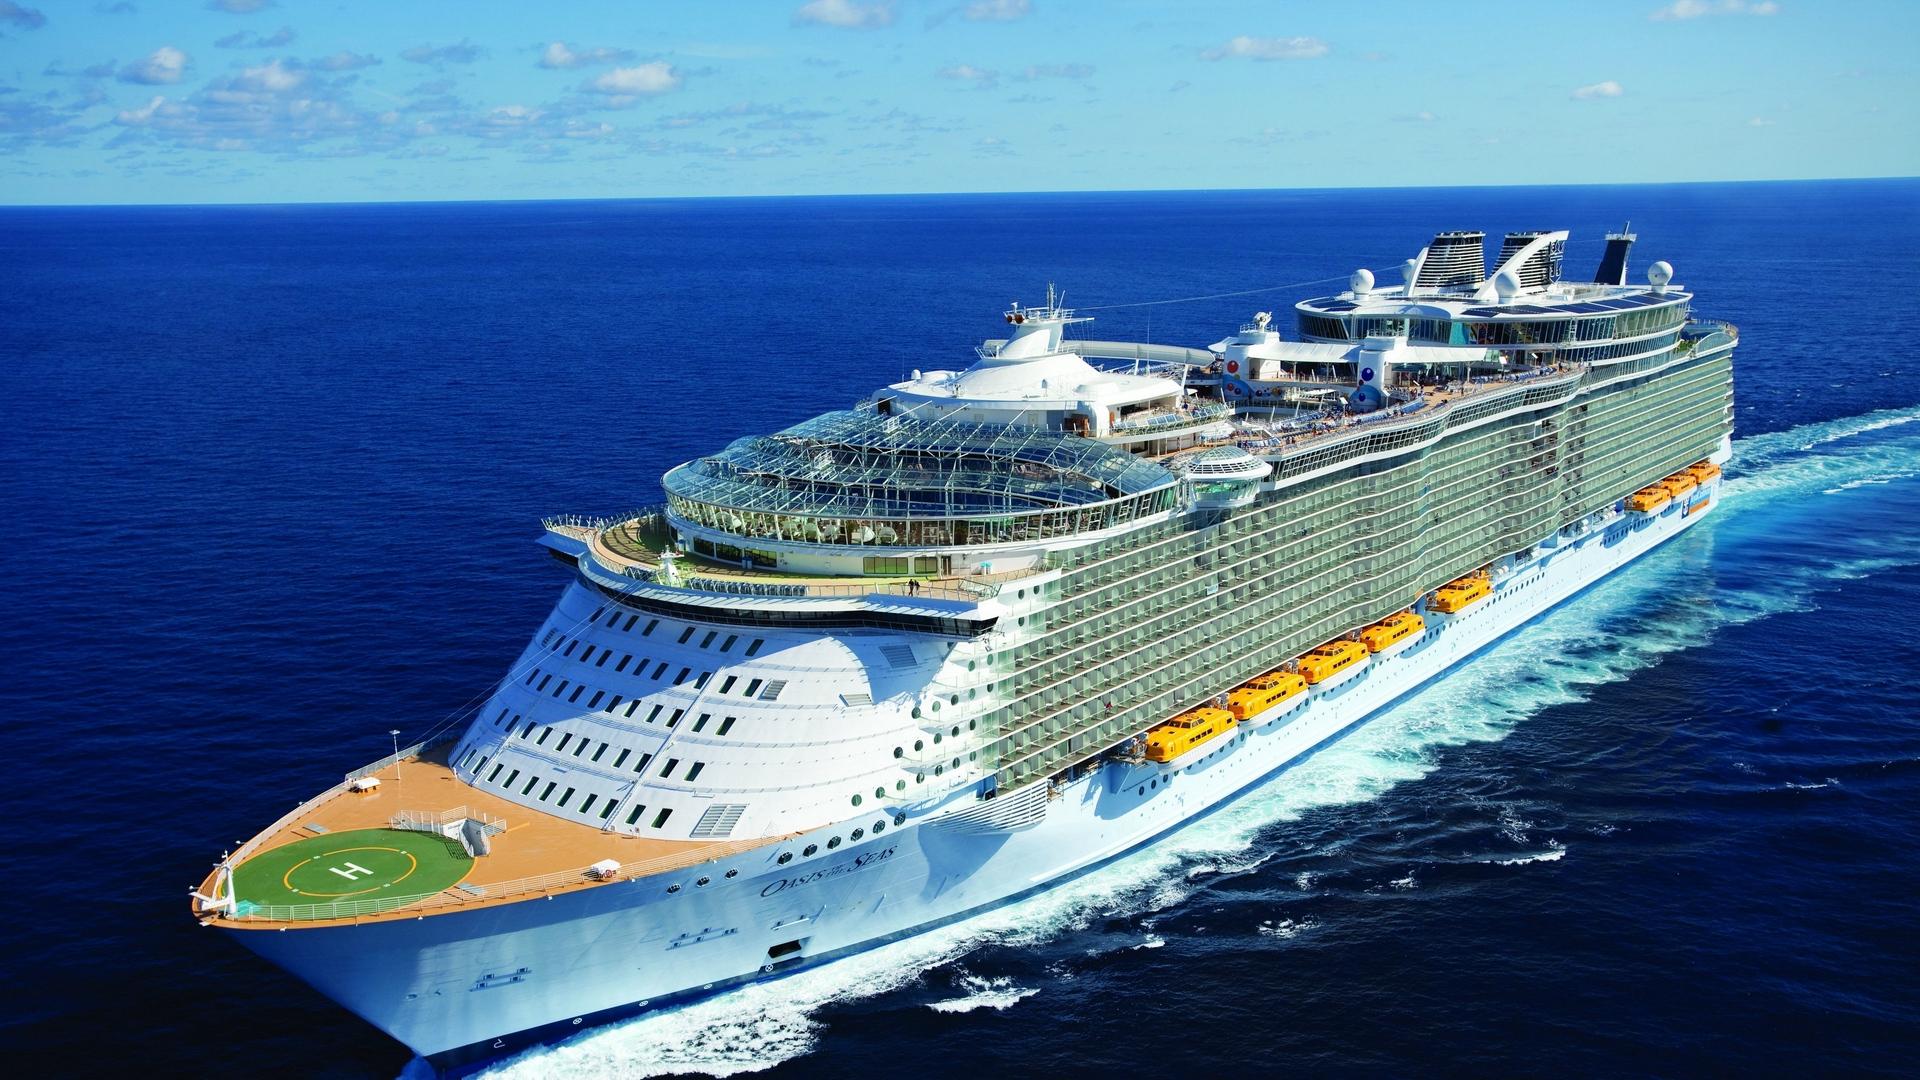 Wallpaper Oasis Of The Seas Cruise Ship 1920x1080 Lumia 1700439 Hd Wallpapers Wallhere